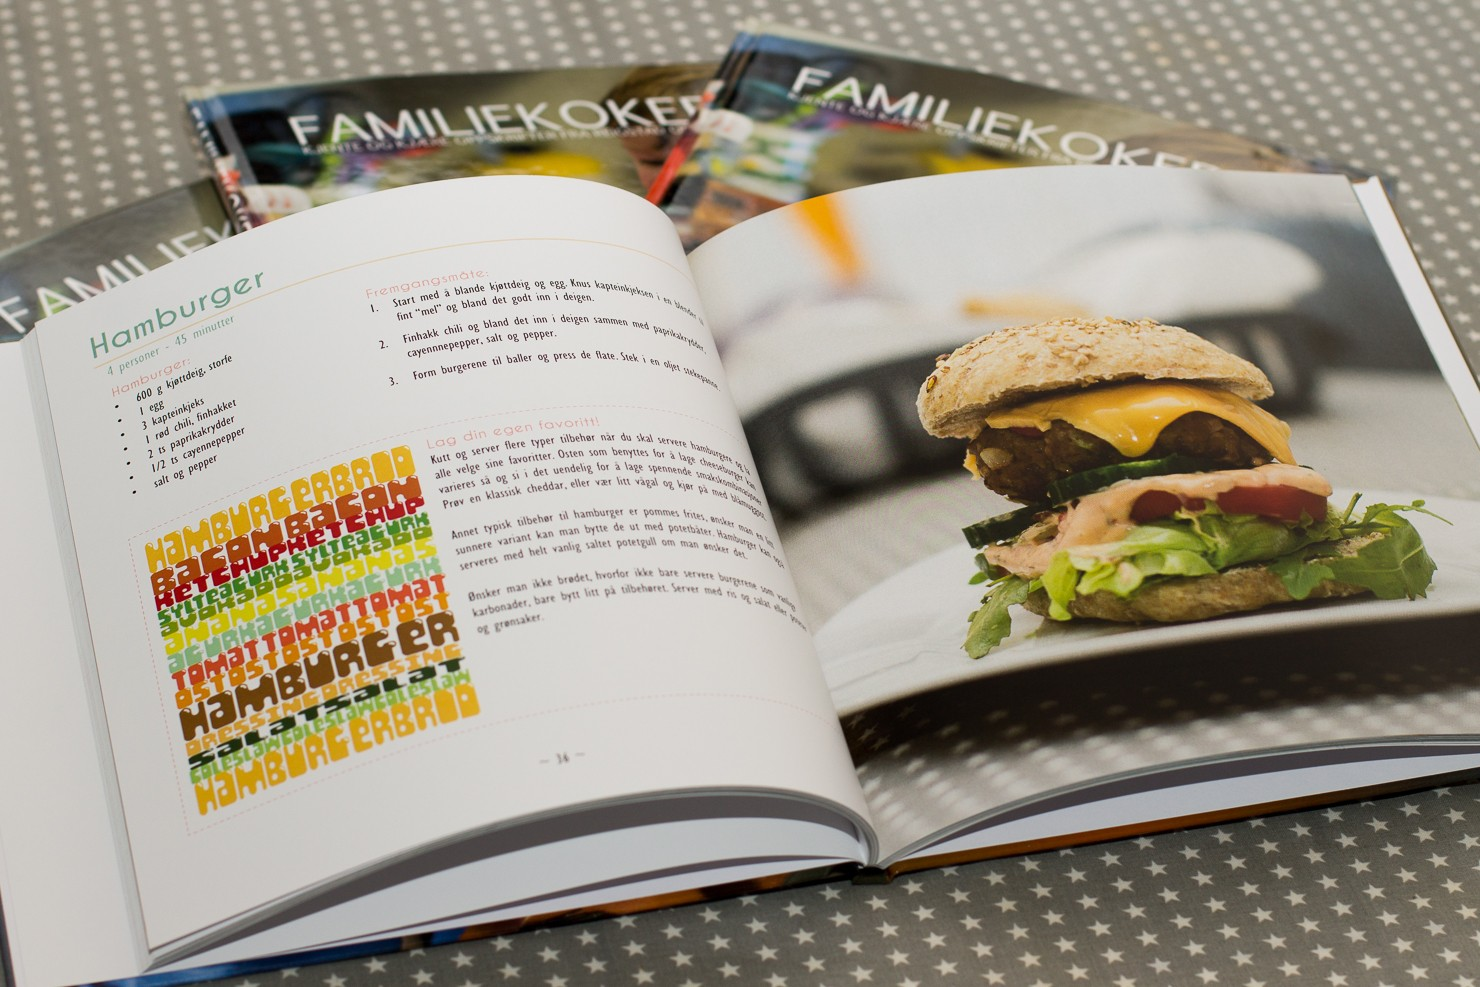 Familiekokebok, innhold, hamburger